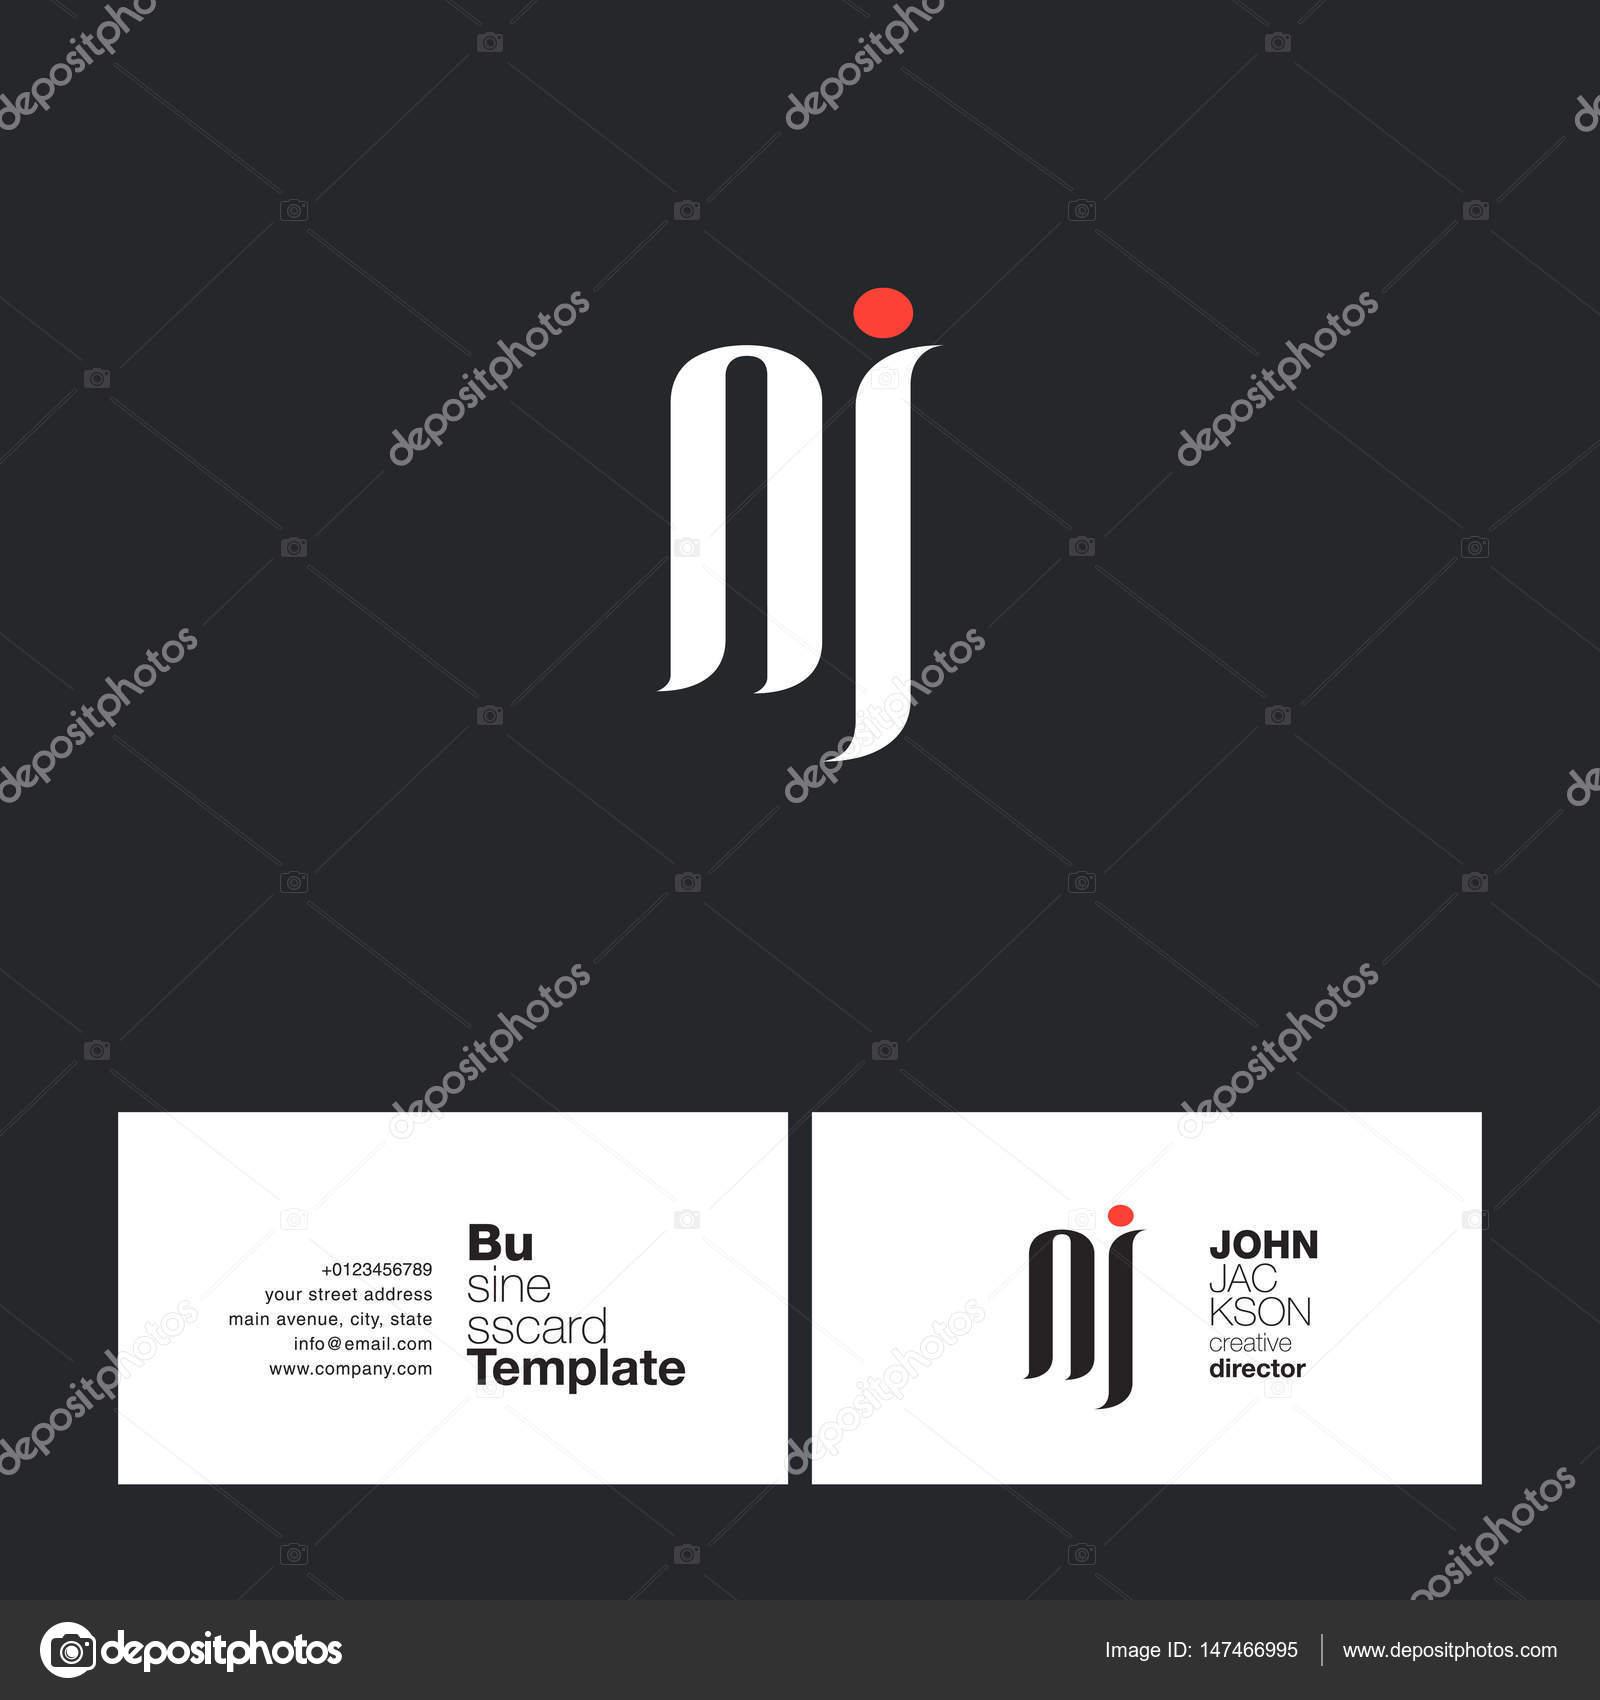 NJ Letters Logo Business Card — Stock Vector © brainbistro #147466995